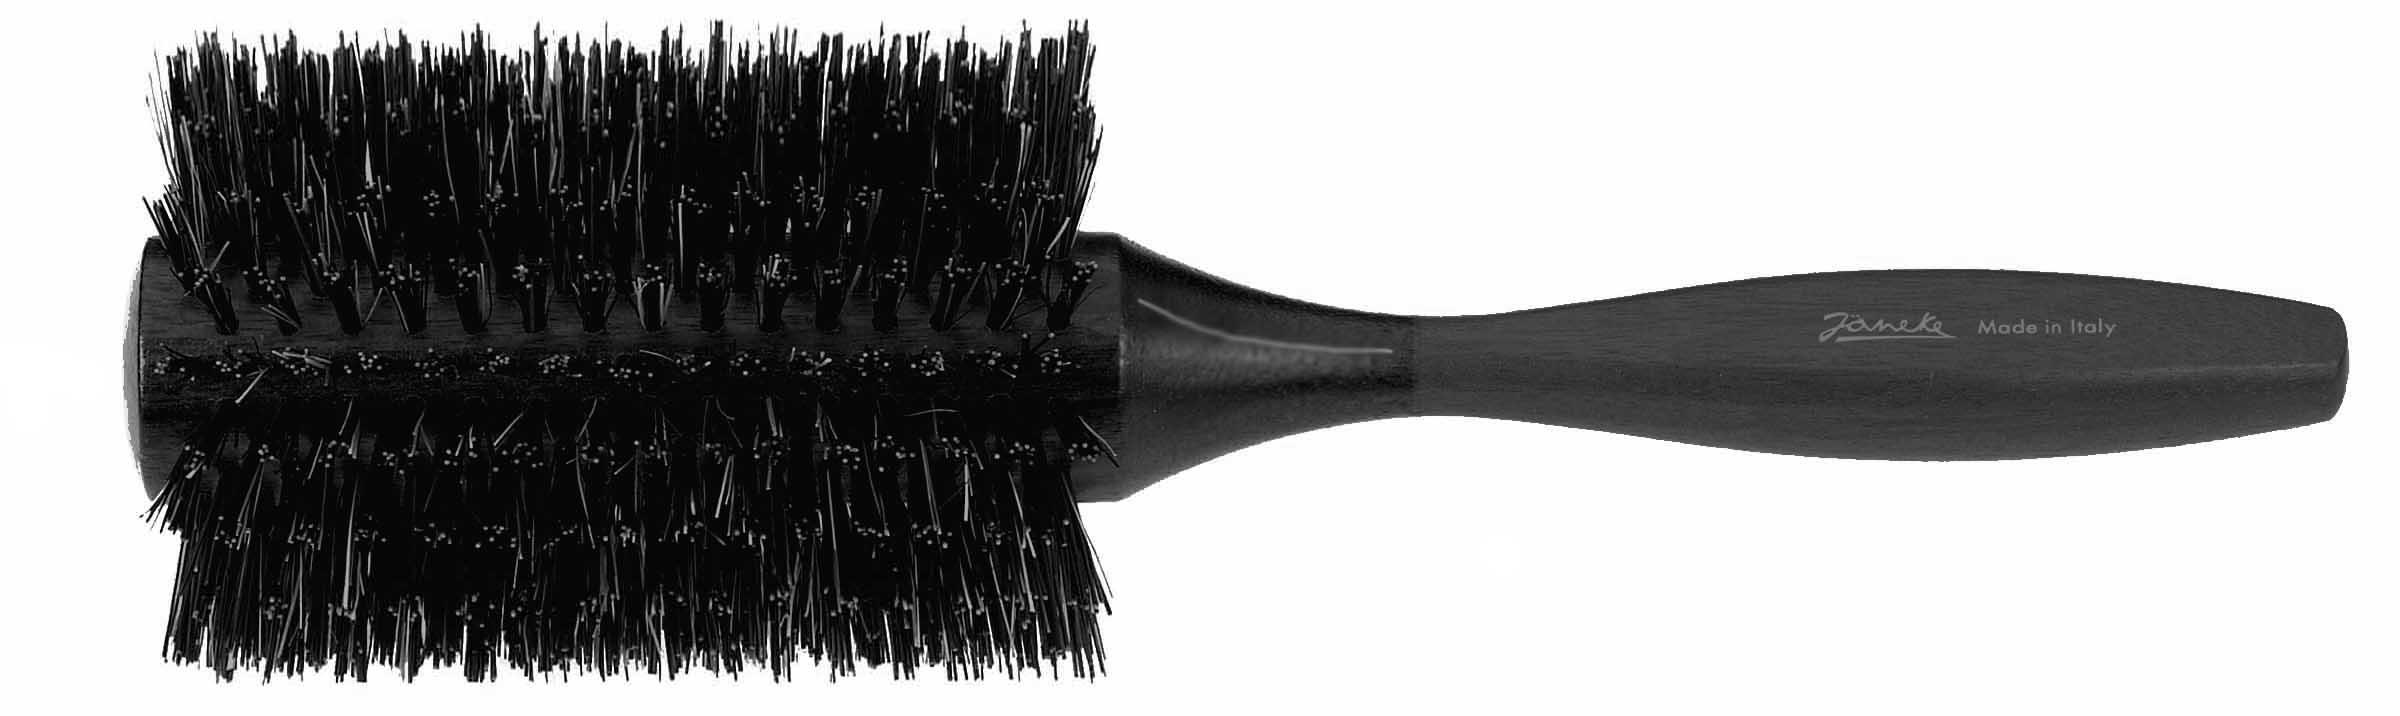 Professional round hair-brush Diameter mm 60 Cod. SP384V